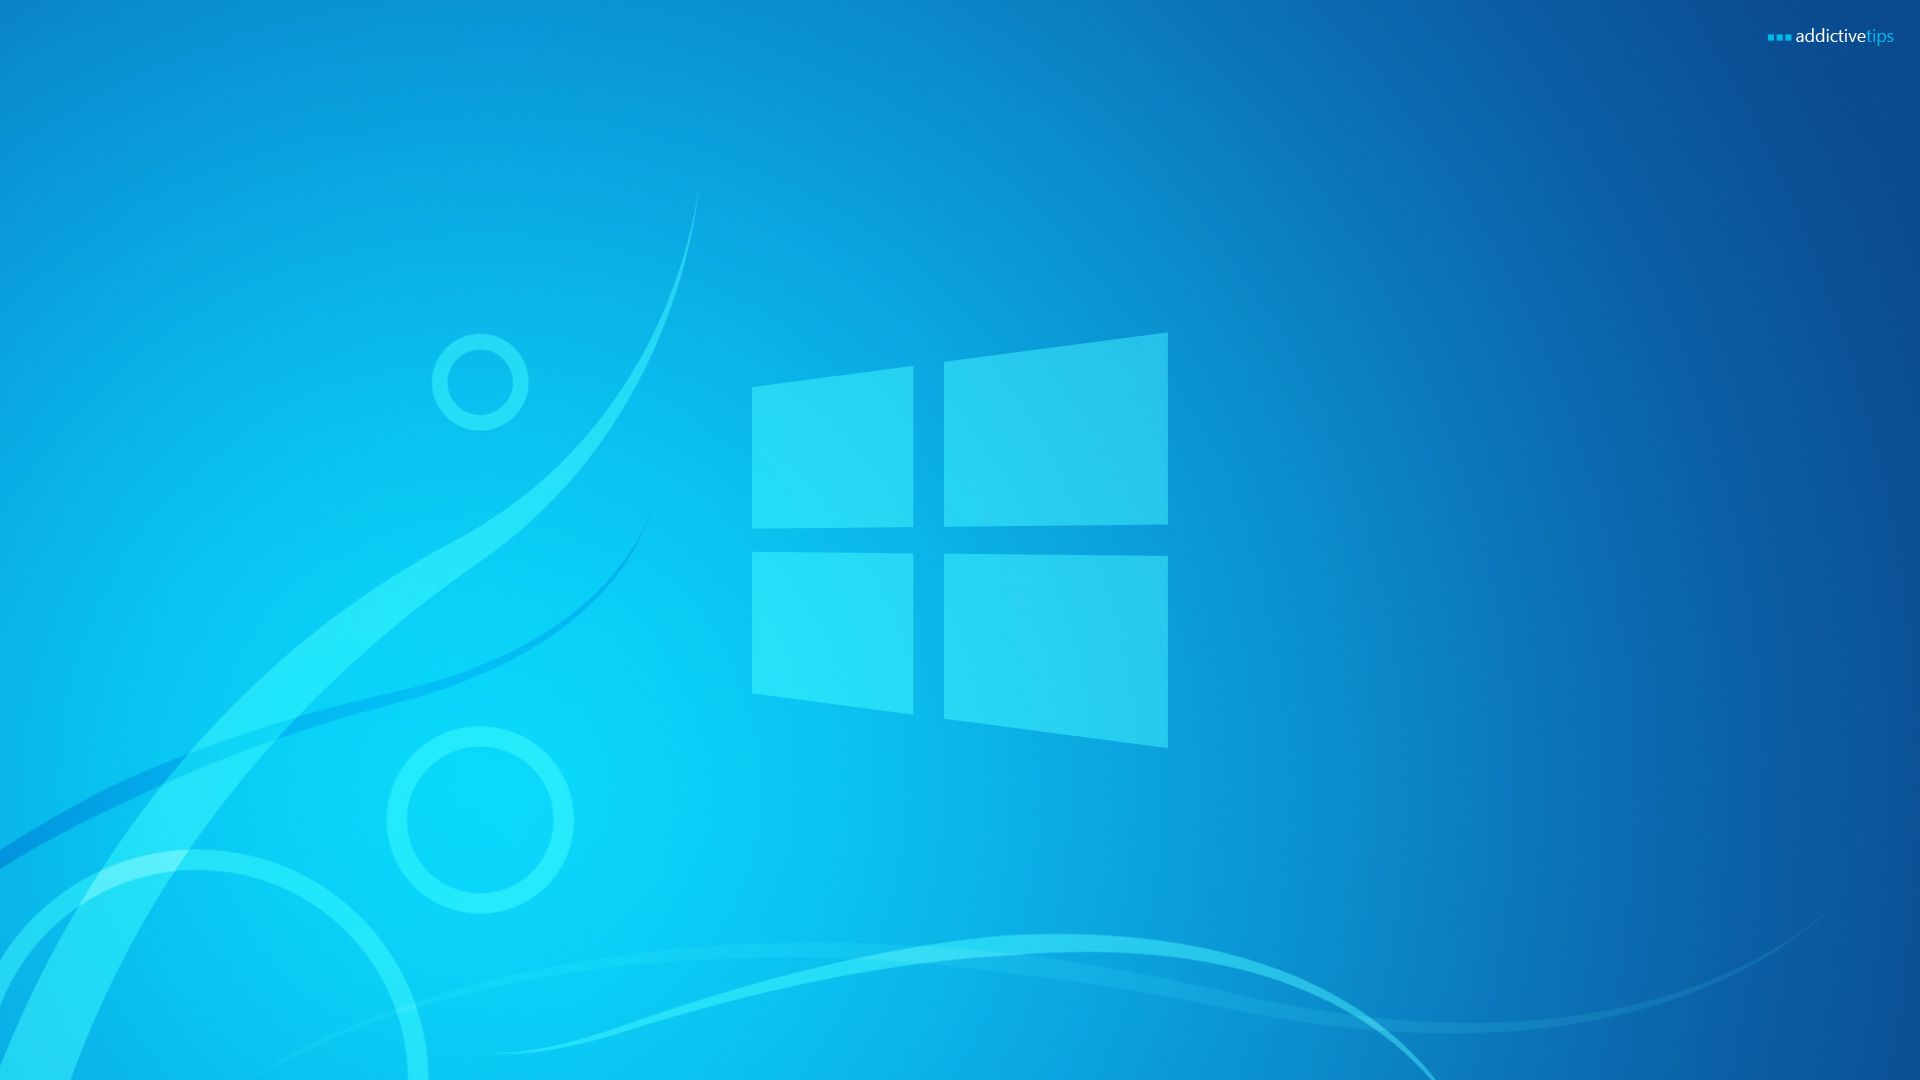 Windows 8 Wallpapers   Top Windows 8 Backgrounds 1920x1080